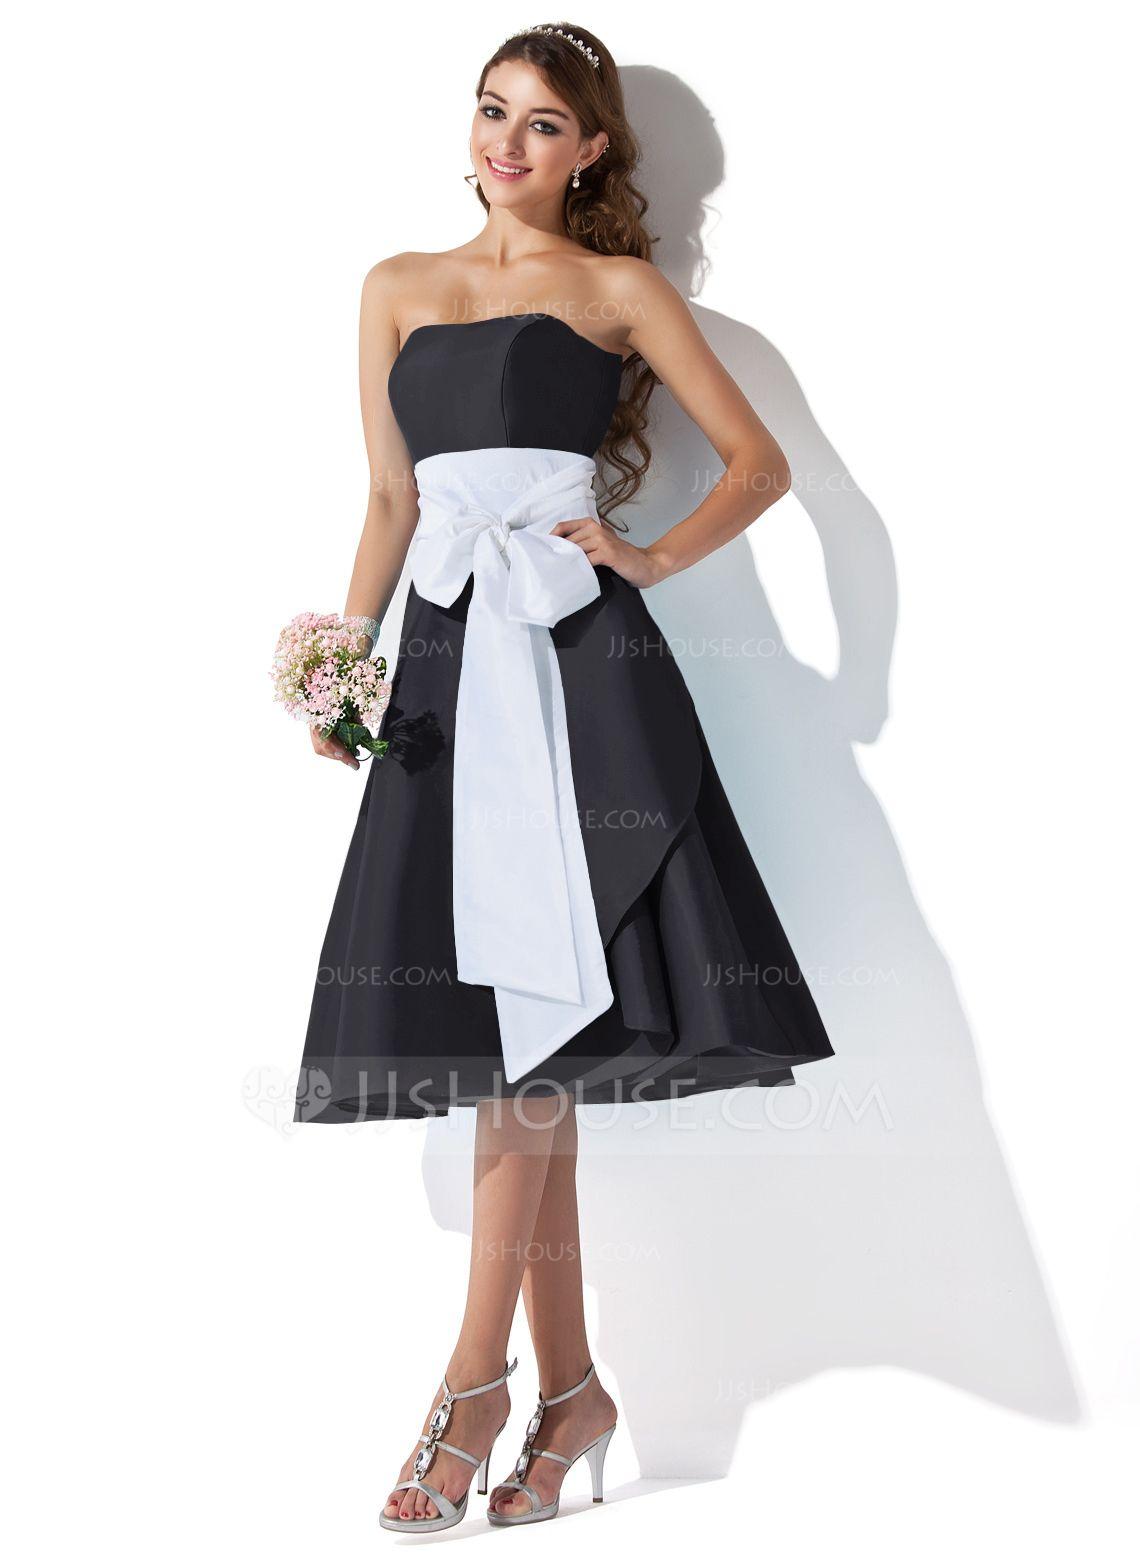 Alineprincess sweetheart kneelength taffeta bridesmaid dress with